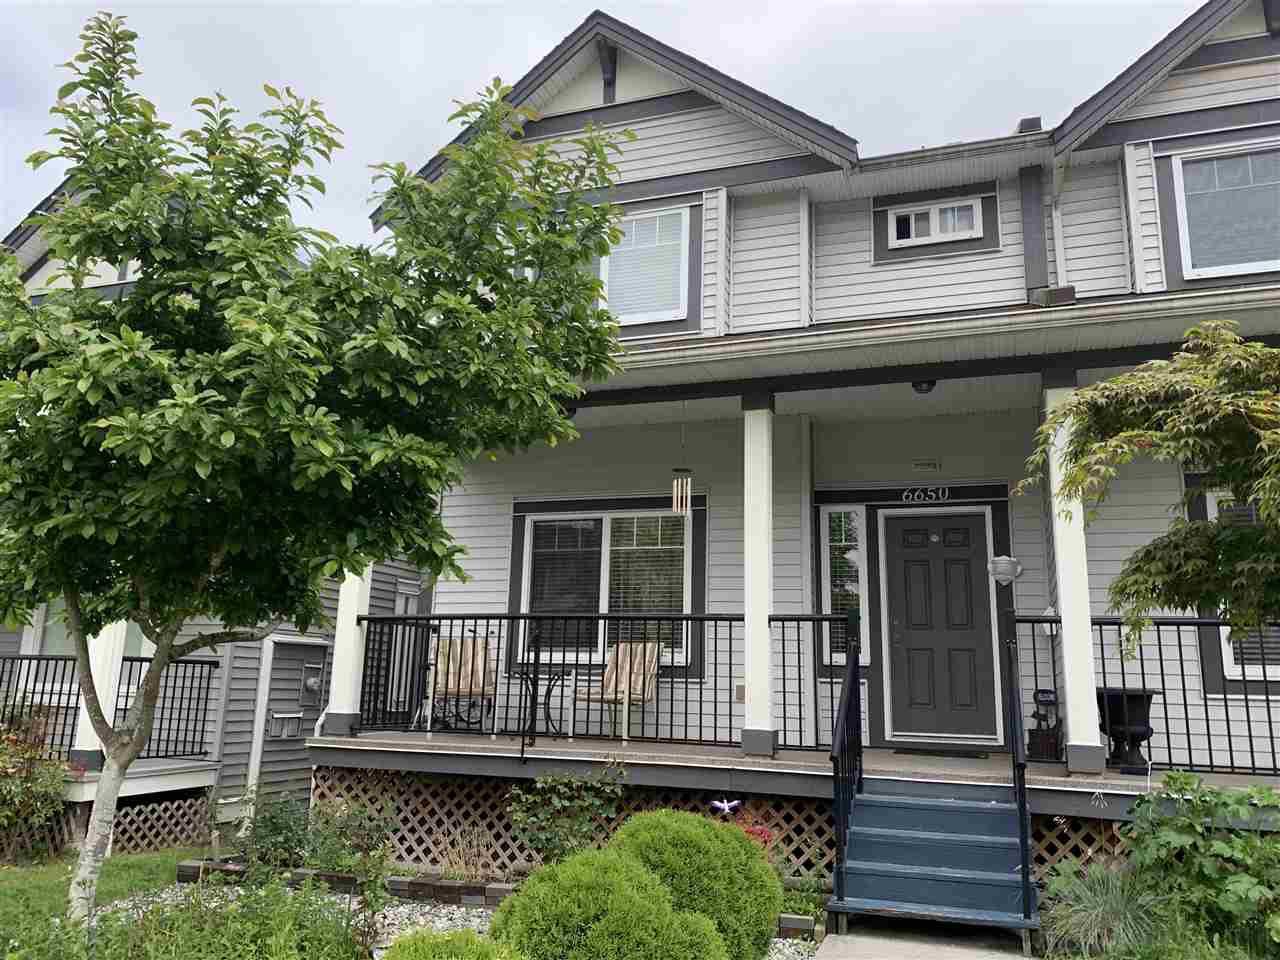 Main Photo: 6650 121 Street in Surrey: West Newton Condo for sale : MLS®# R2371954